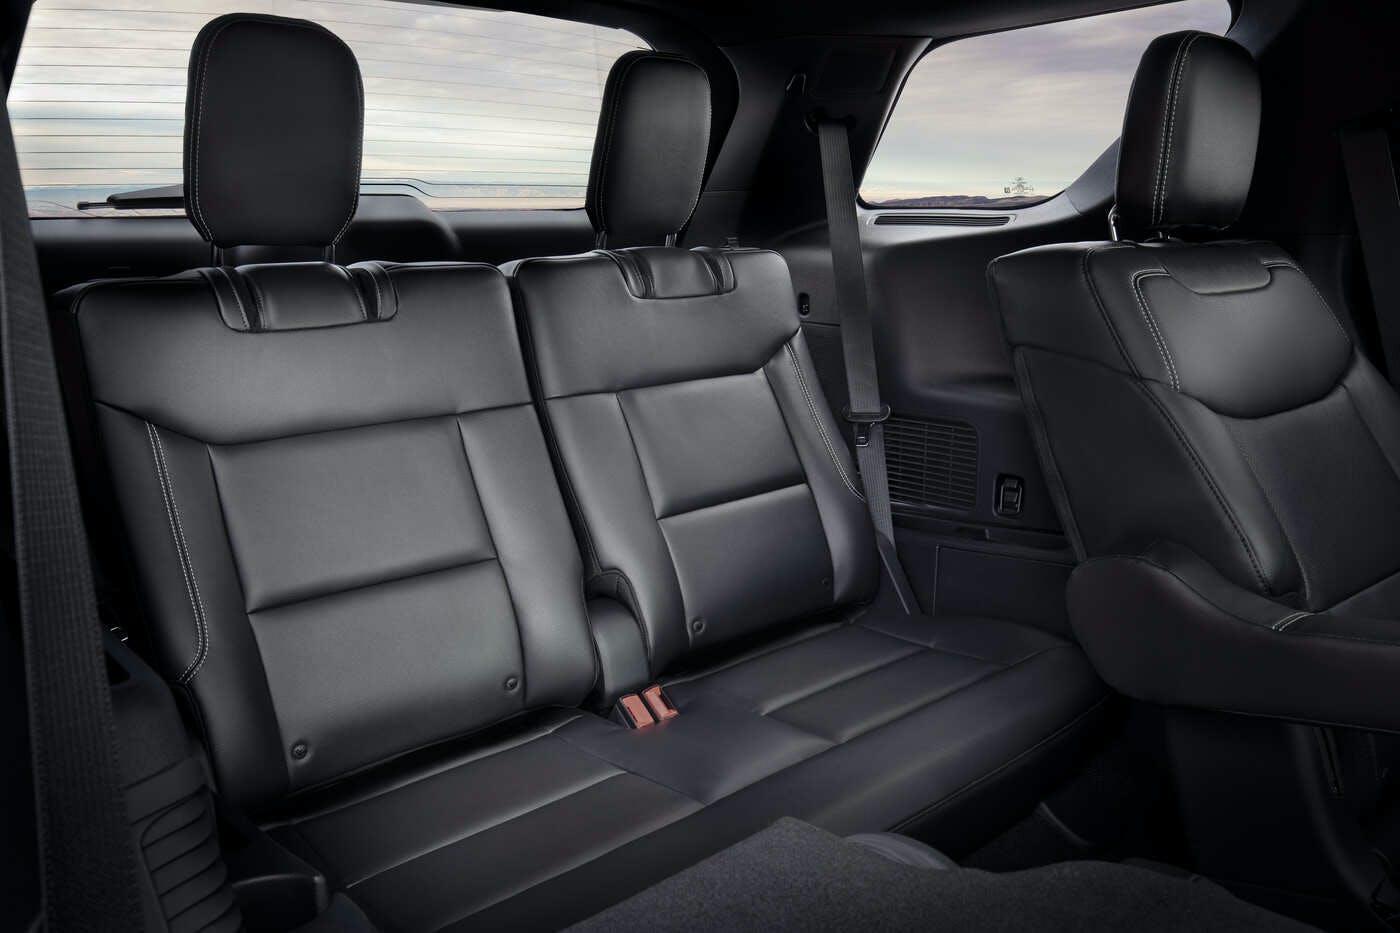 2020 Ford Explorer Comparisons Reviews Pictures Truecar